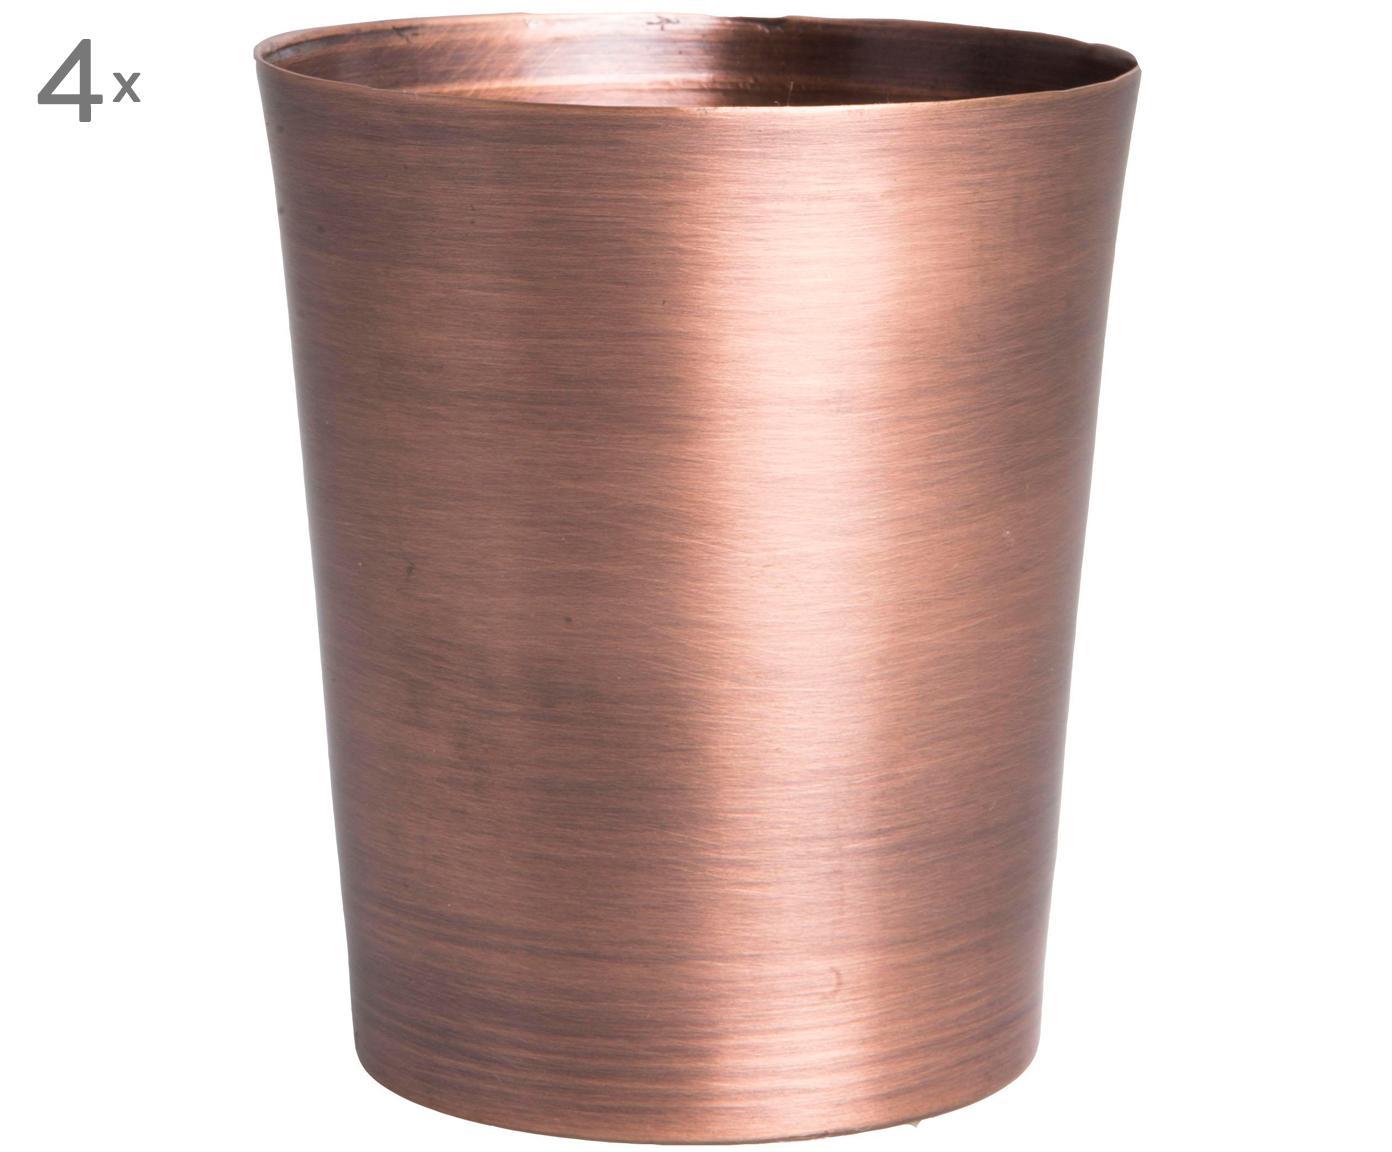 Bekers Copper, 4 stuks, Koper, Koperkleurig, Ø 7 x H 8 cm